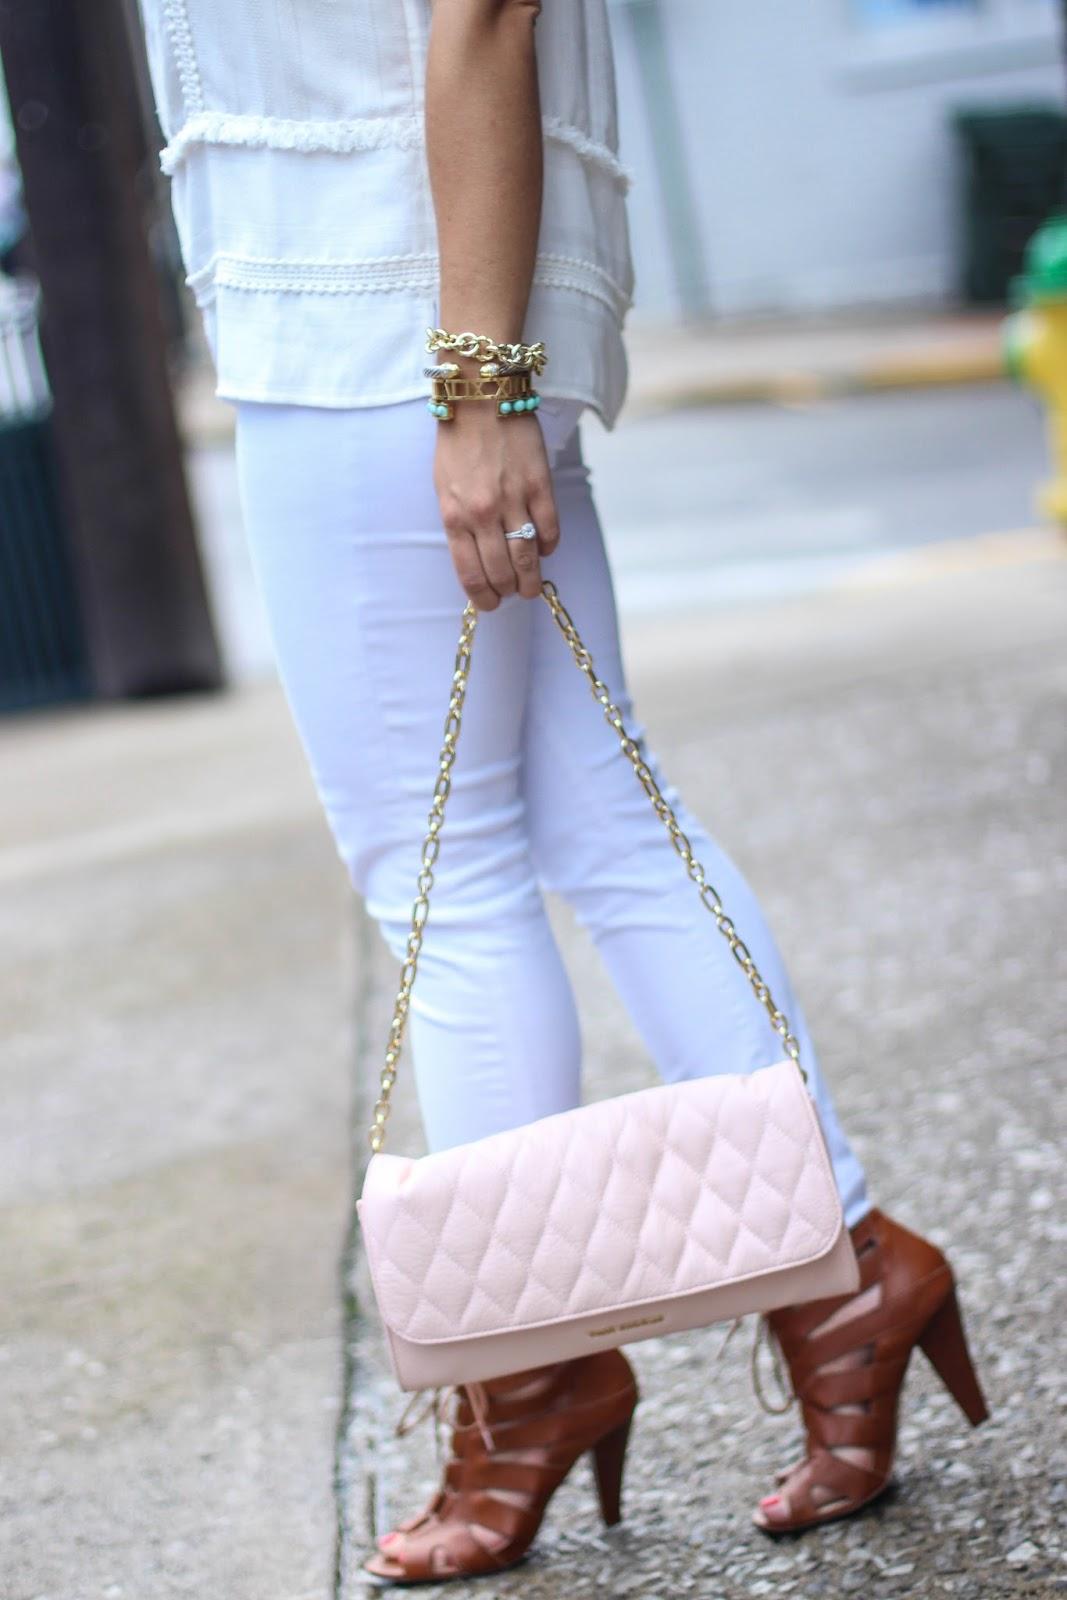 LOFT Top, Vera Bradley Bag, White Jeans, Summer Style